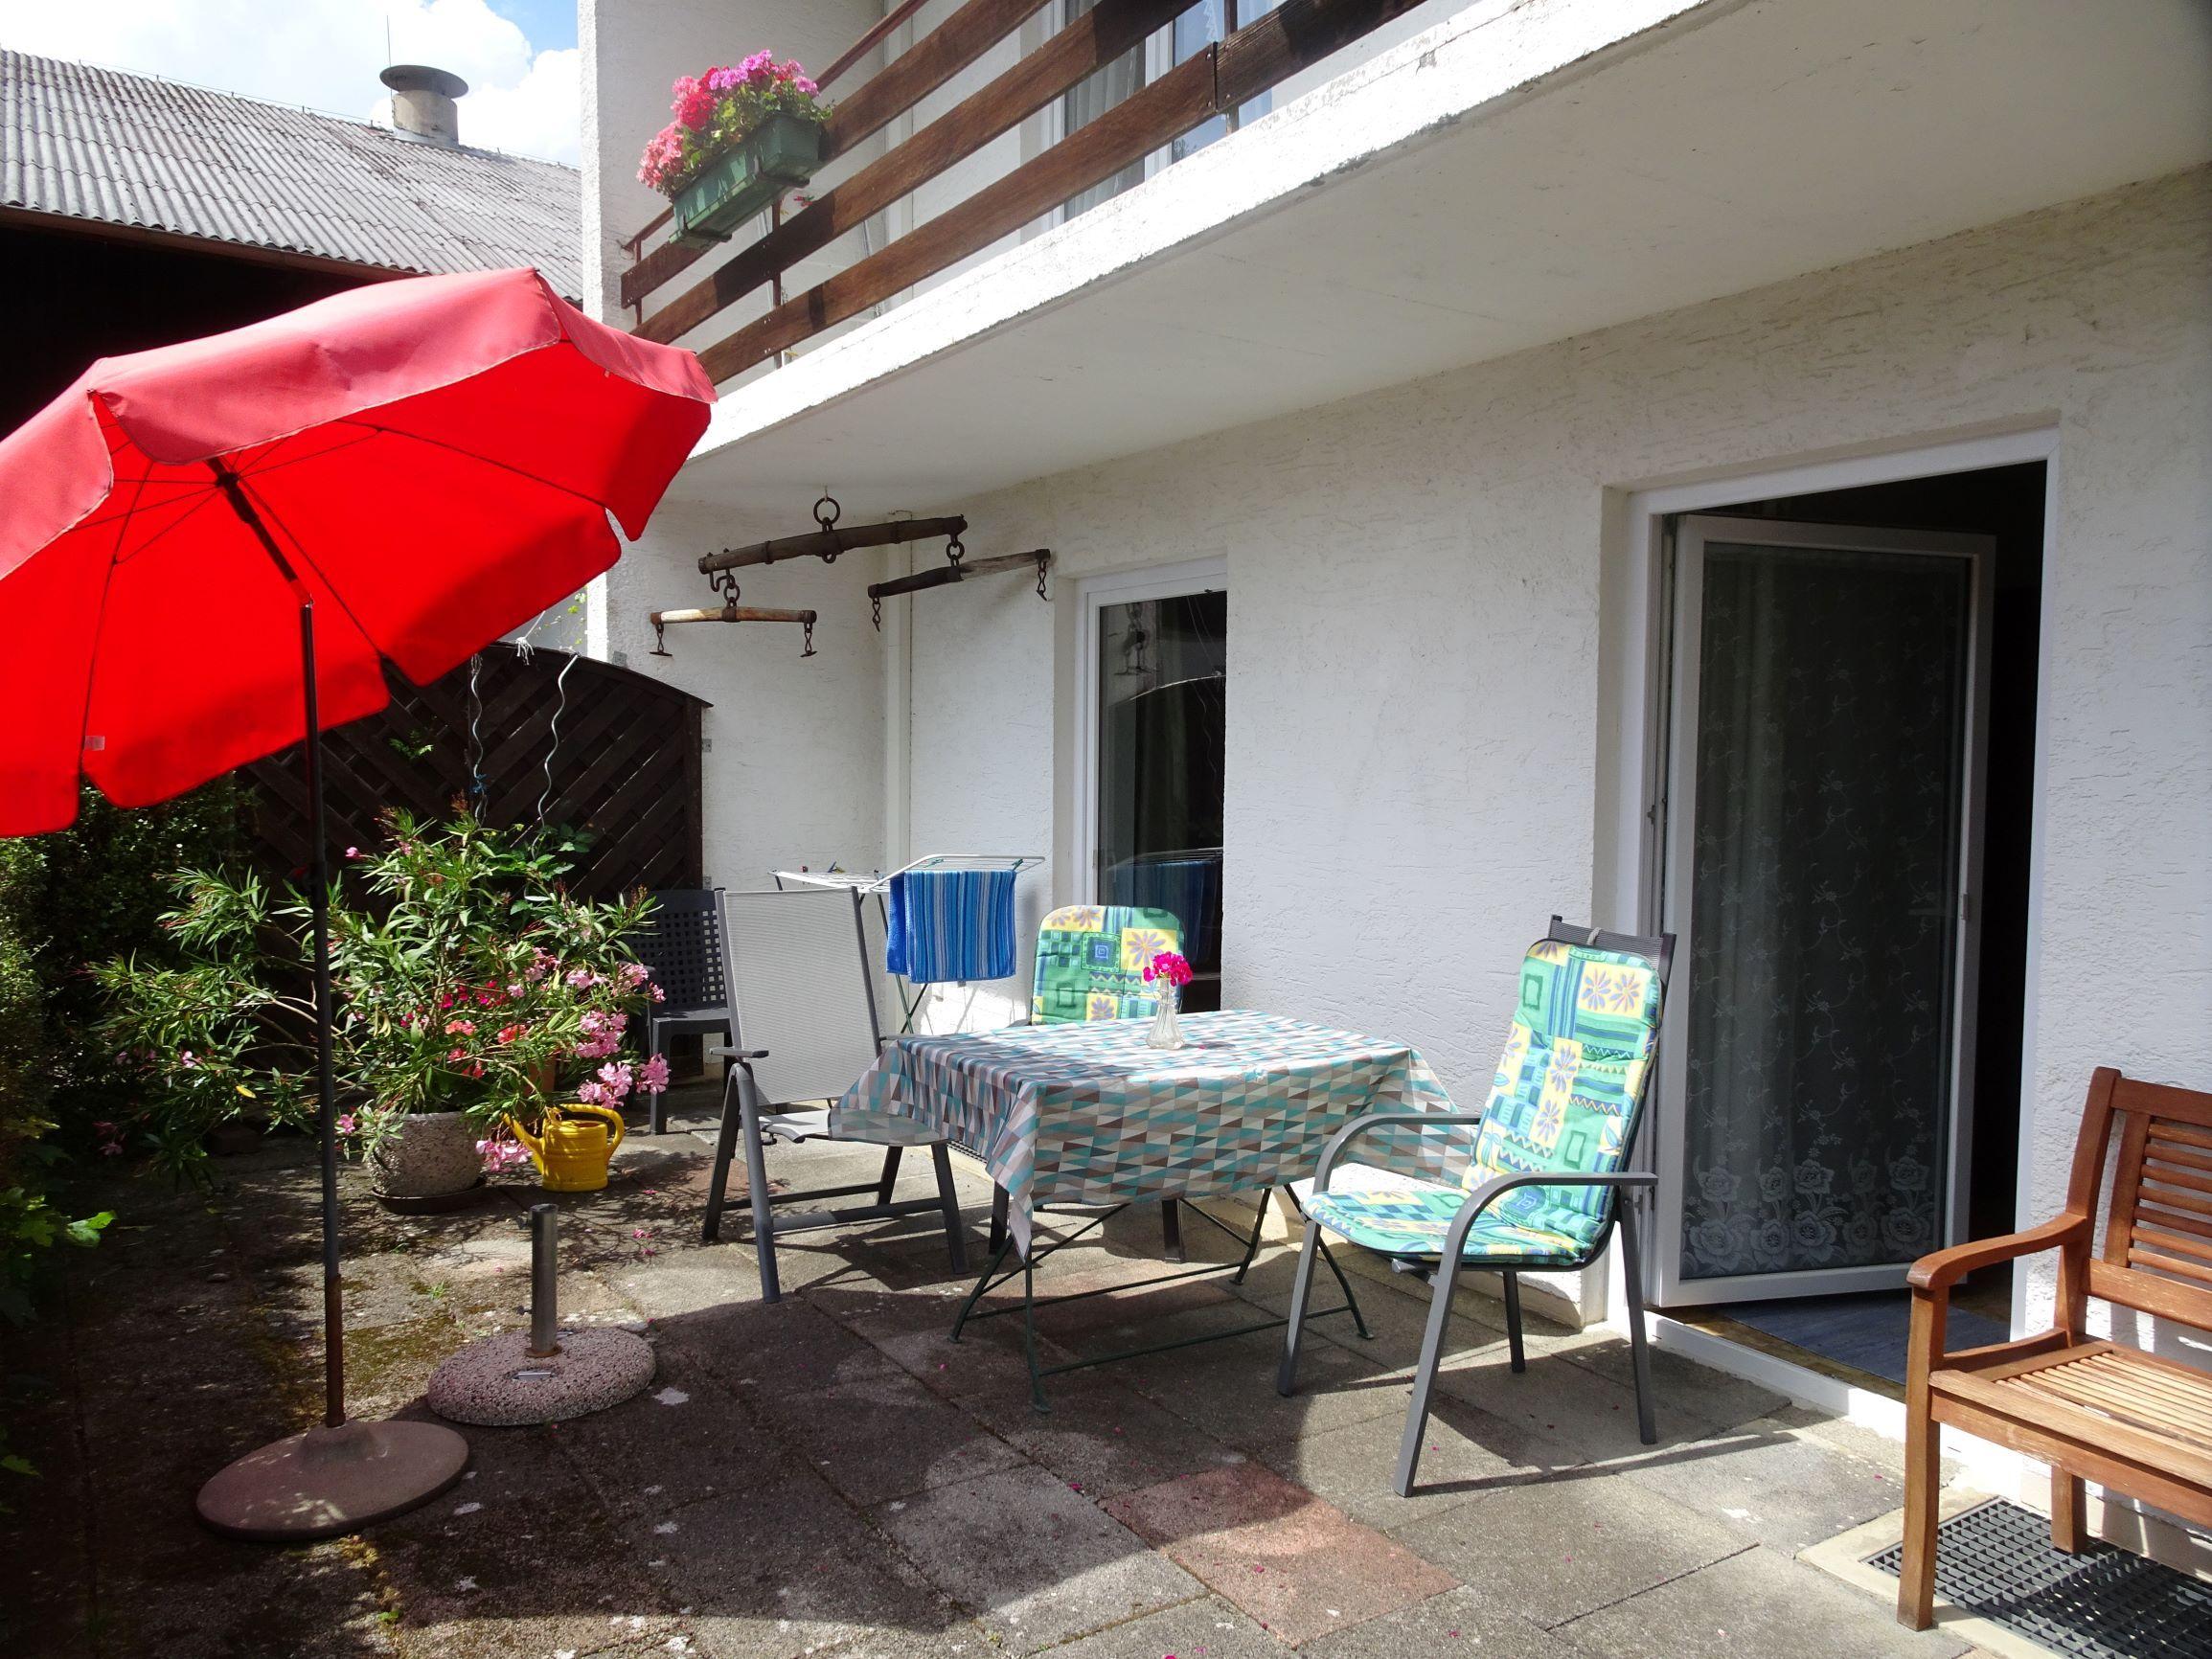 Haus Strobl (DE Gstadt). holiday flat